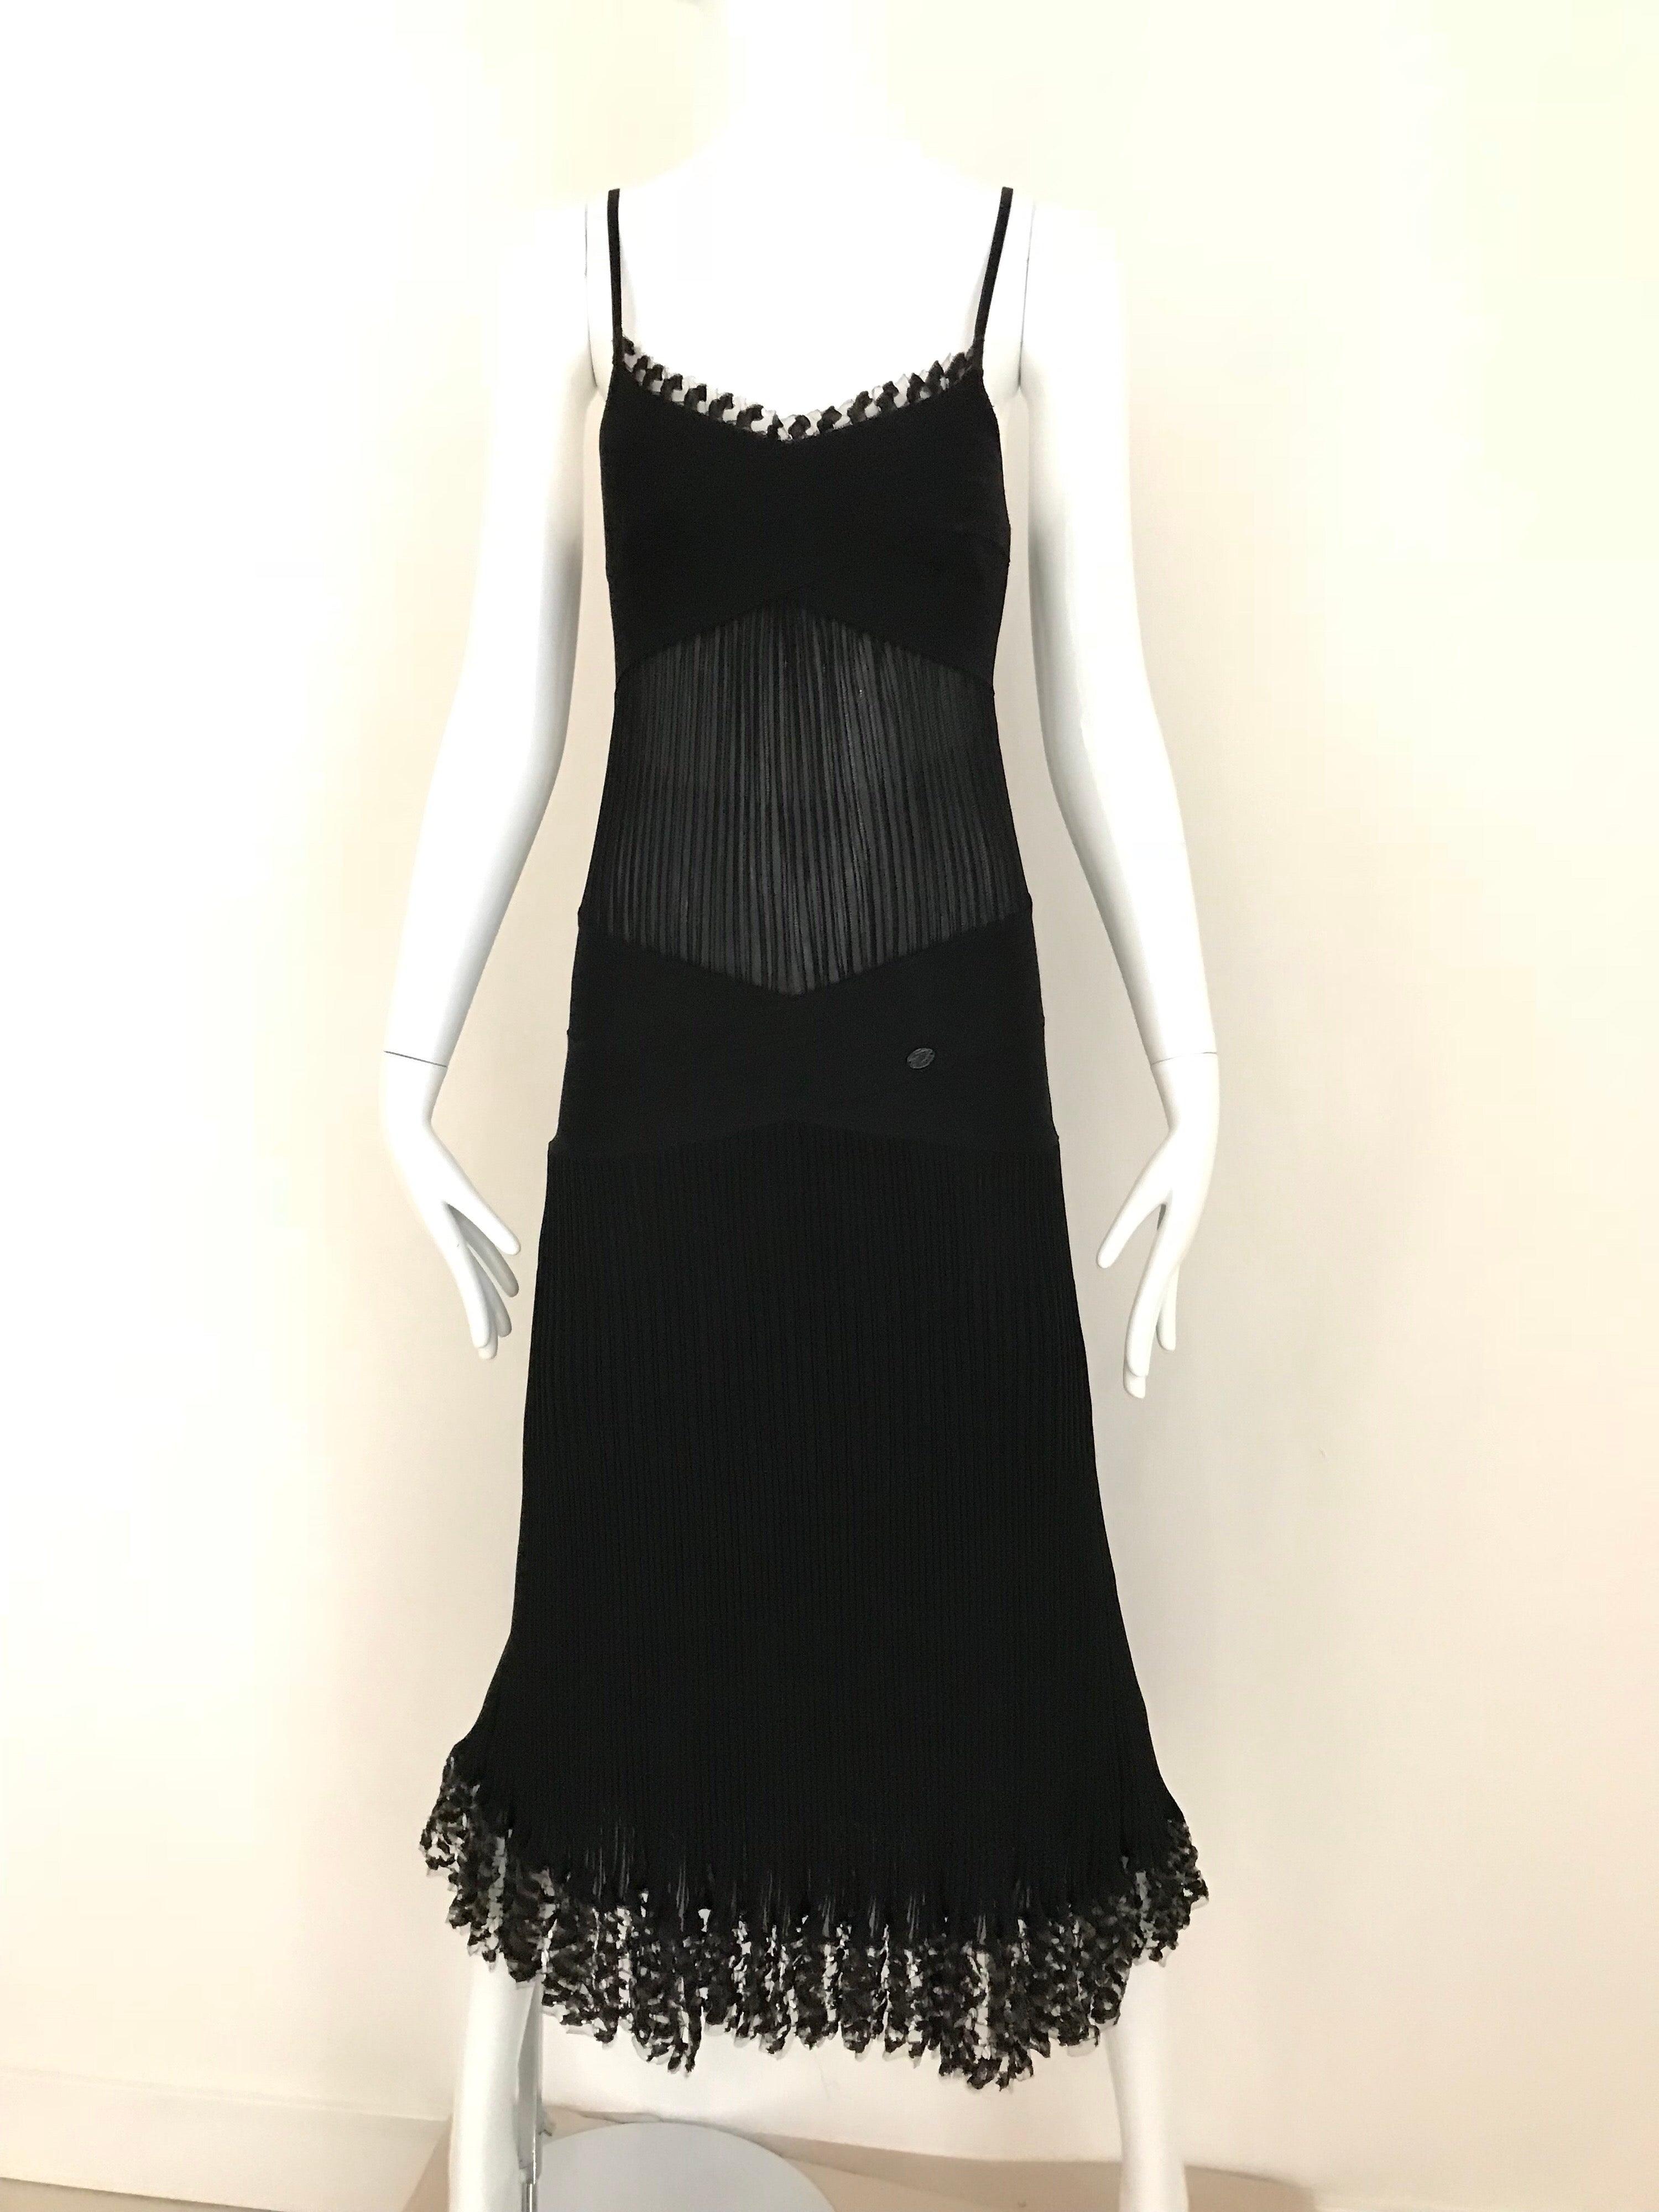 e50d5fc91fa6 CHANEL Black Knit Spaghetti Strap Cocktail Dress For Sale at 1stdibs